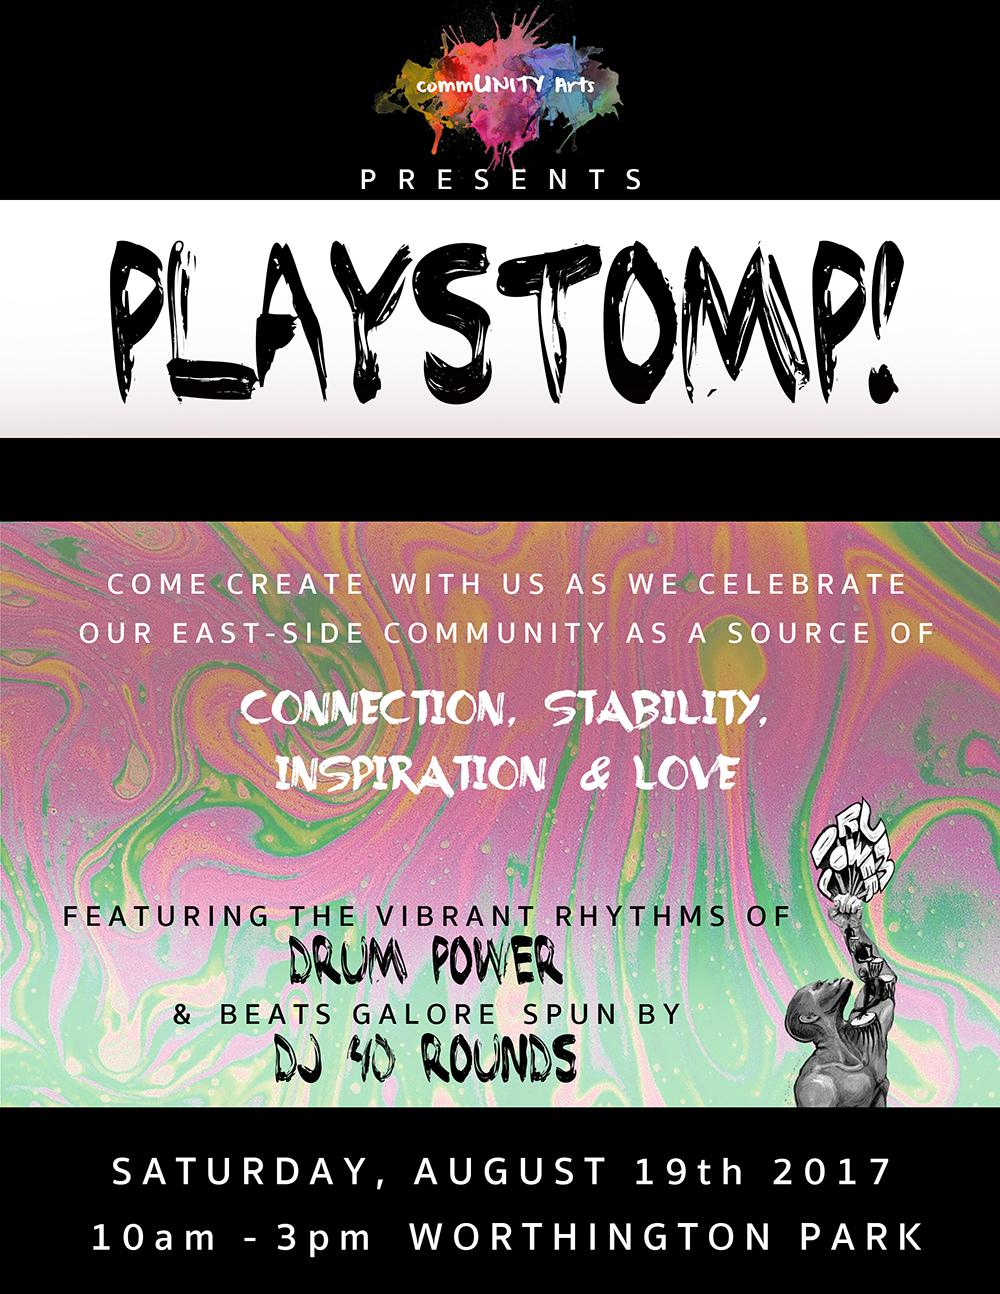 Playstomp Flyer Photo.jpg